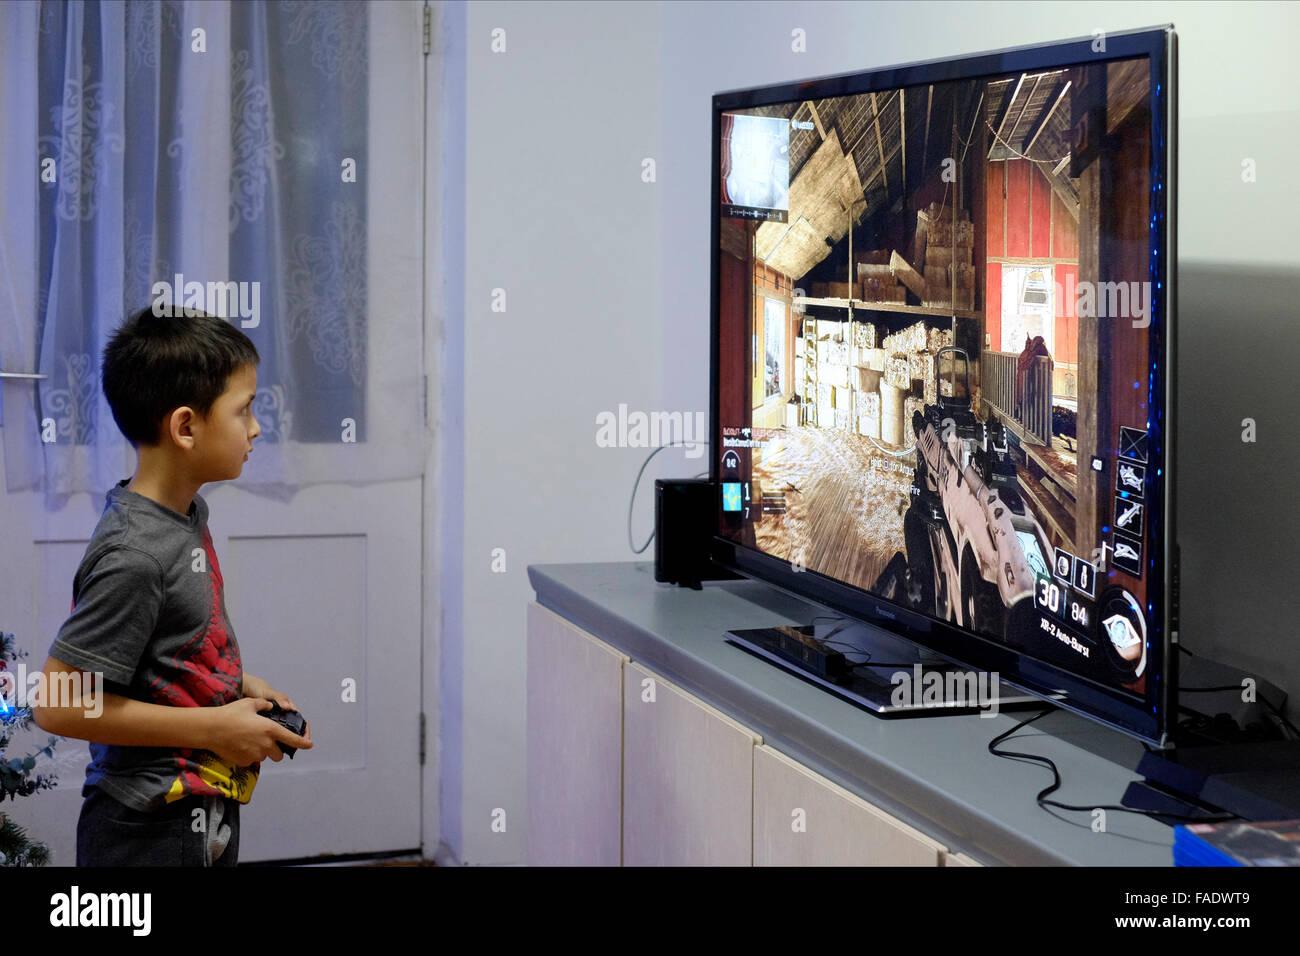 Jeune garçon jouant jeu vidéo sur grand écran plat plat en angleterre Photo Stock